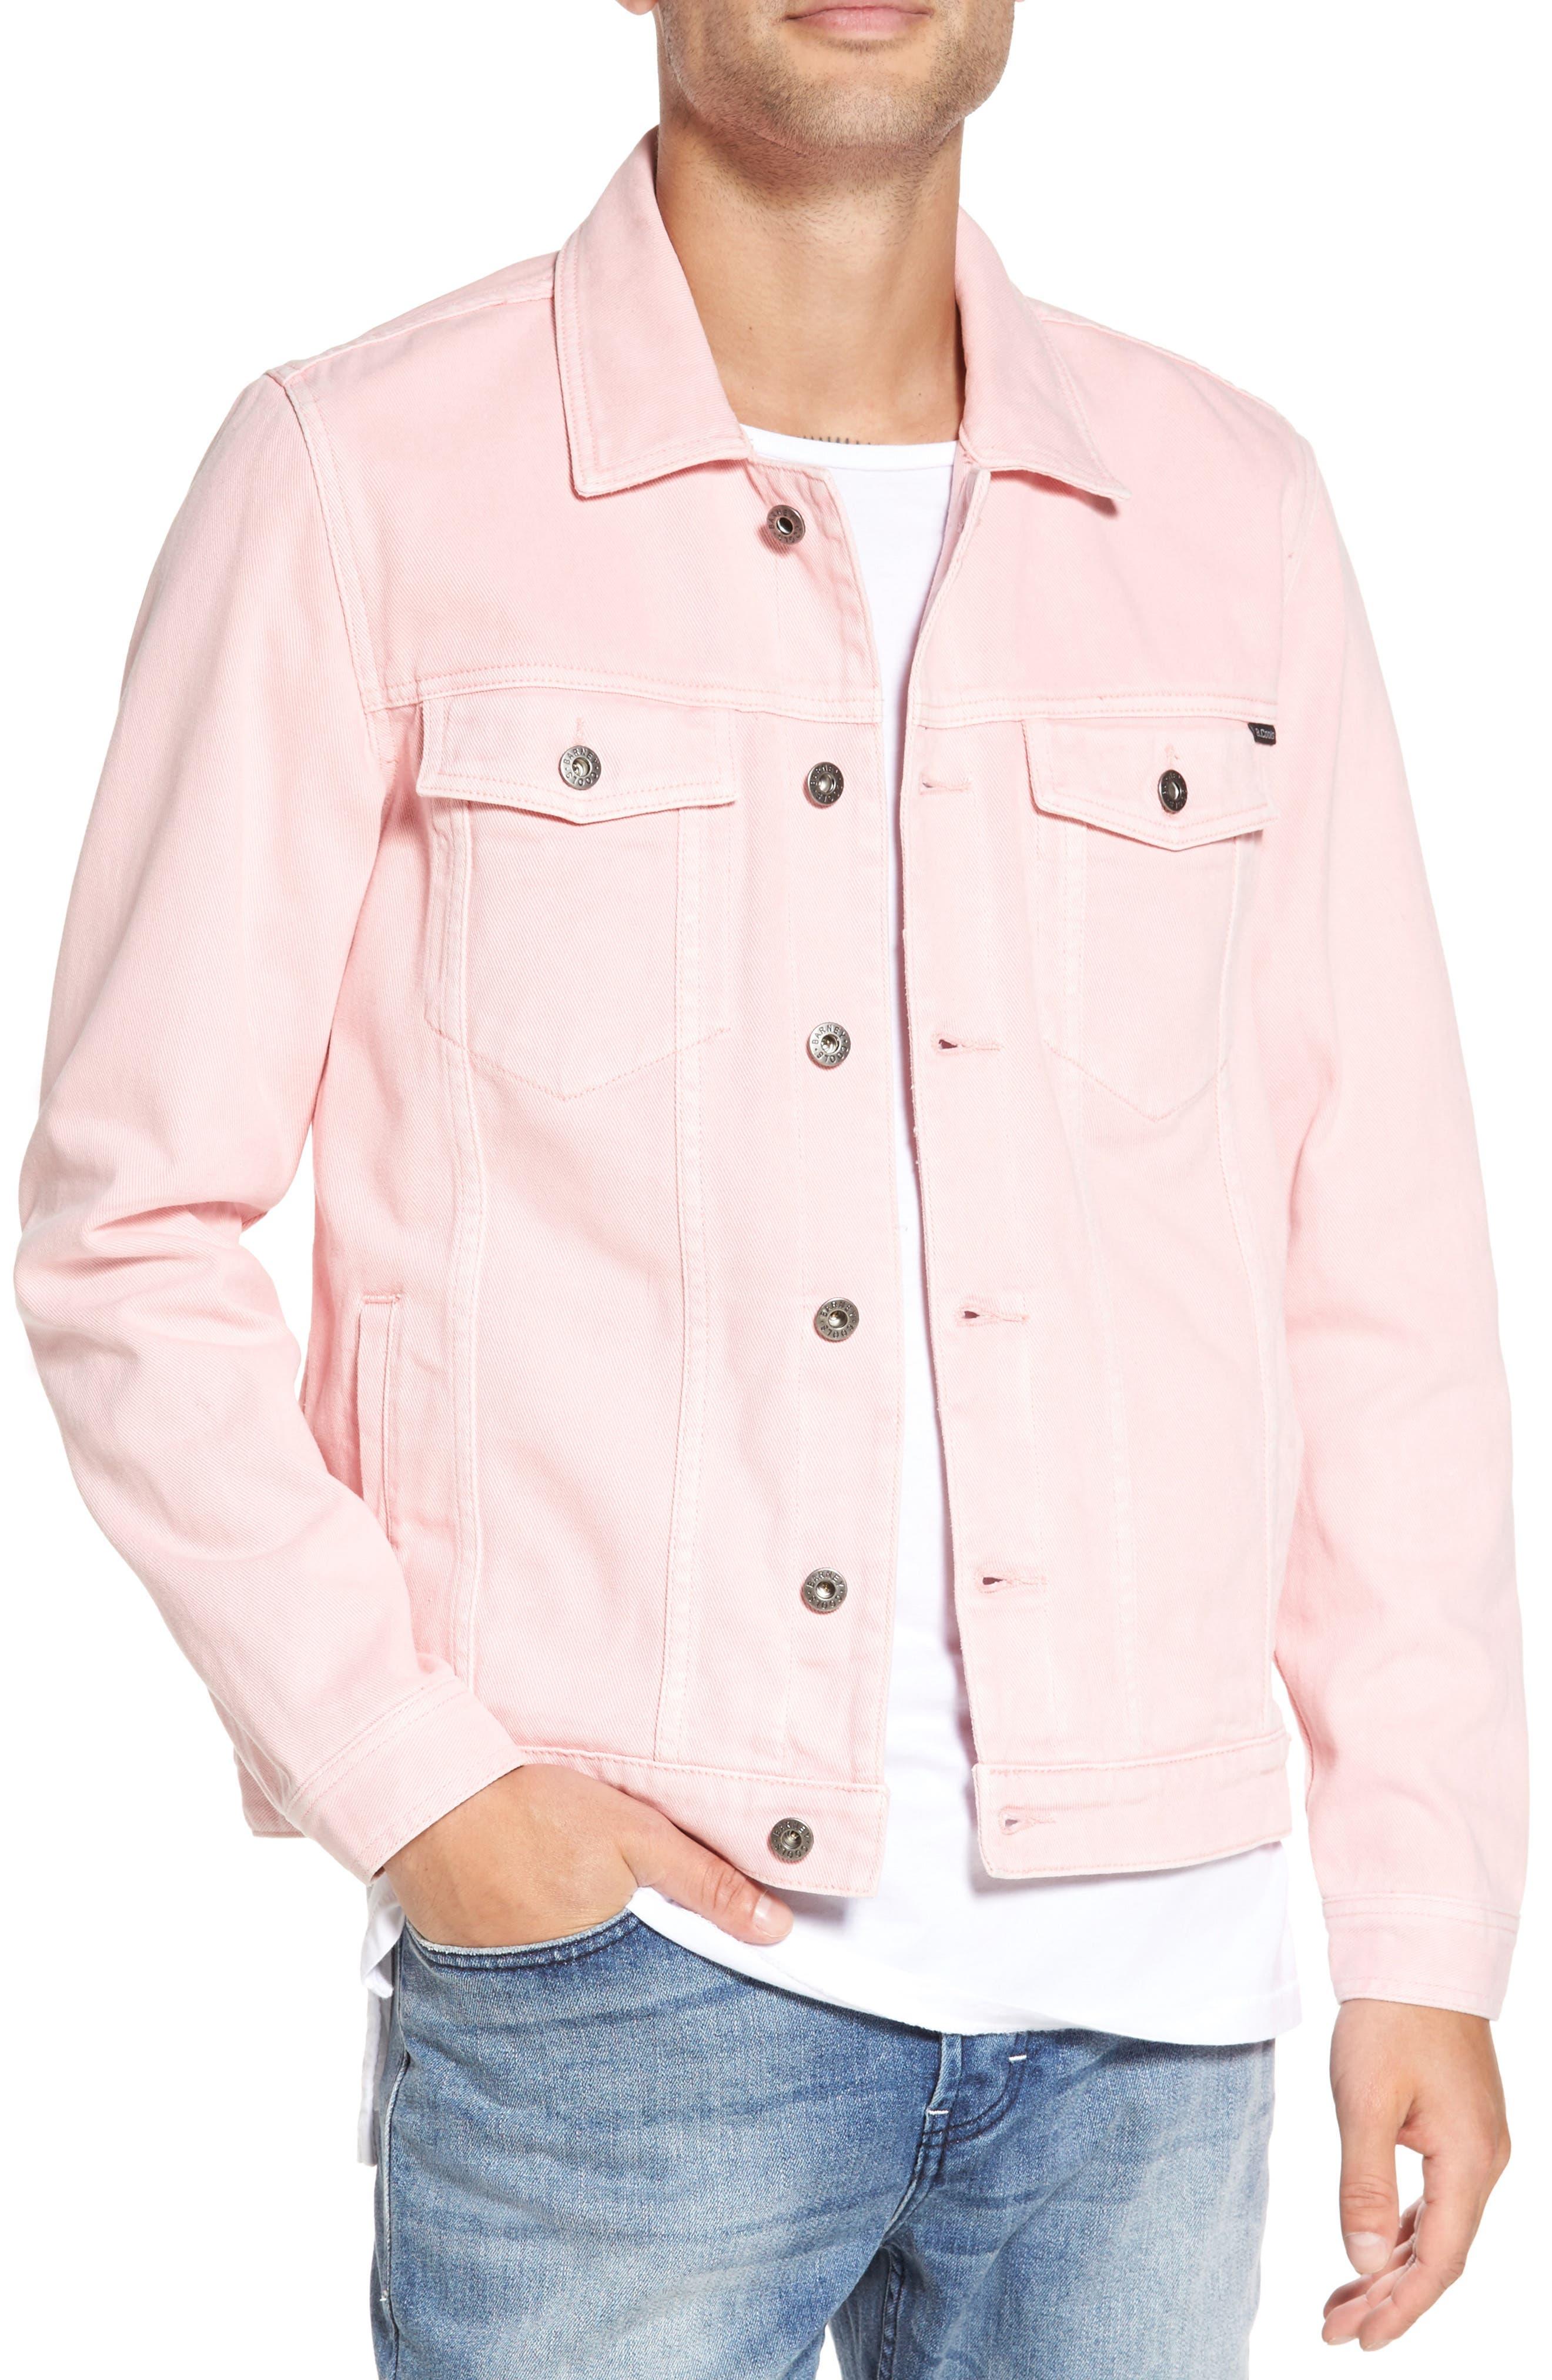 Barney Cools B.Rigid Denim Jacket